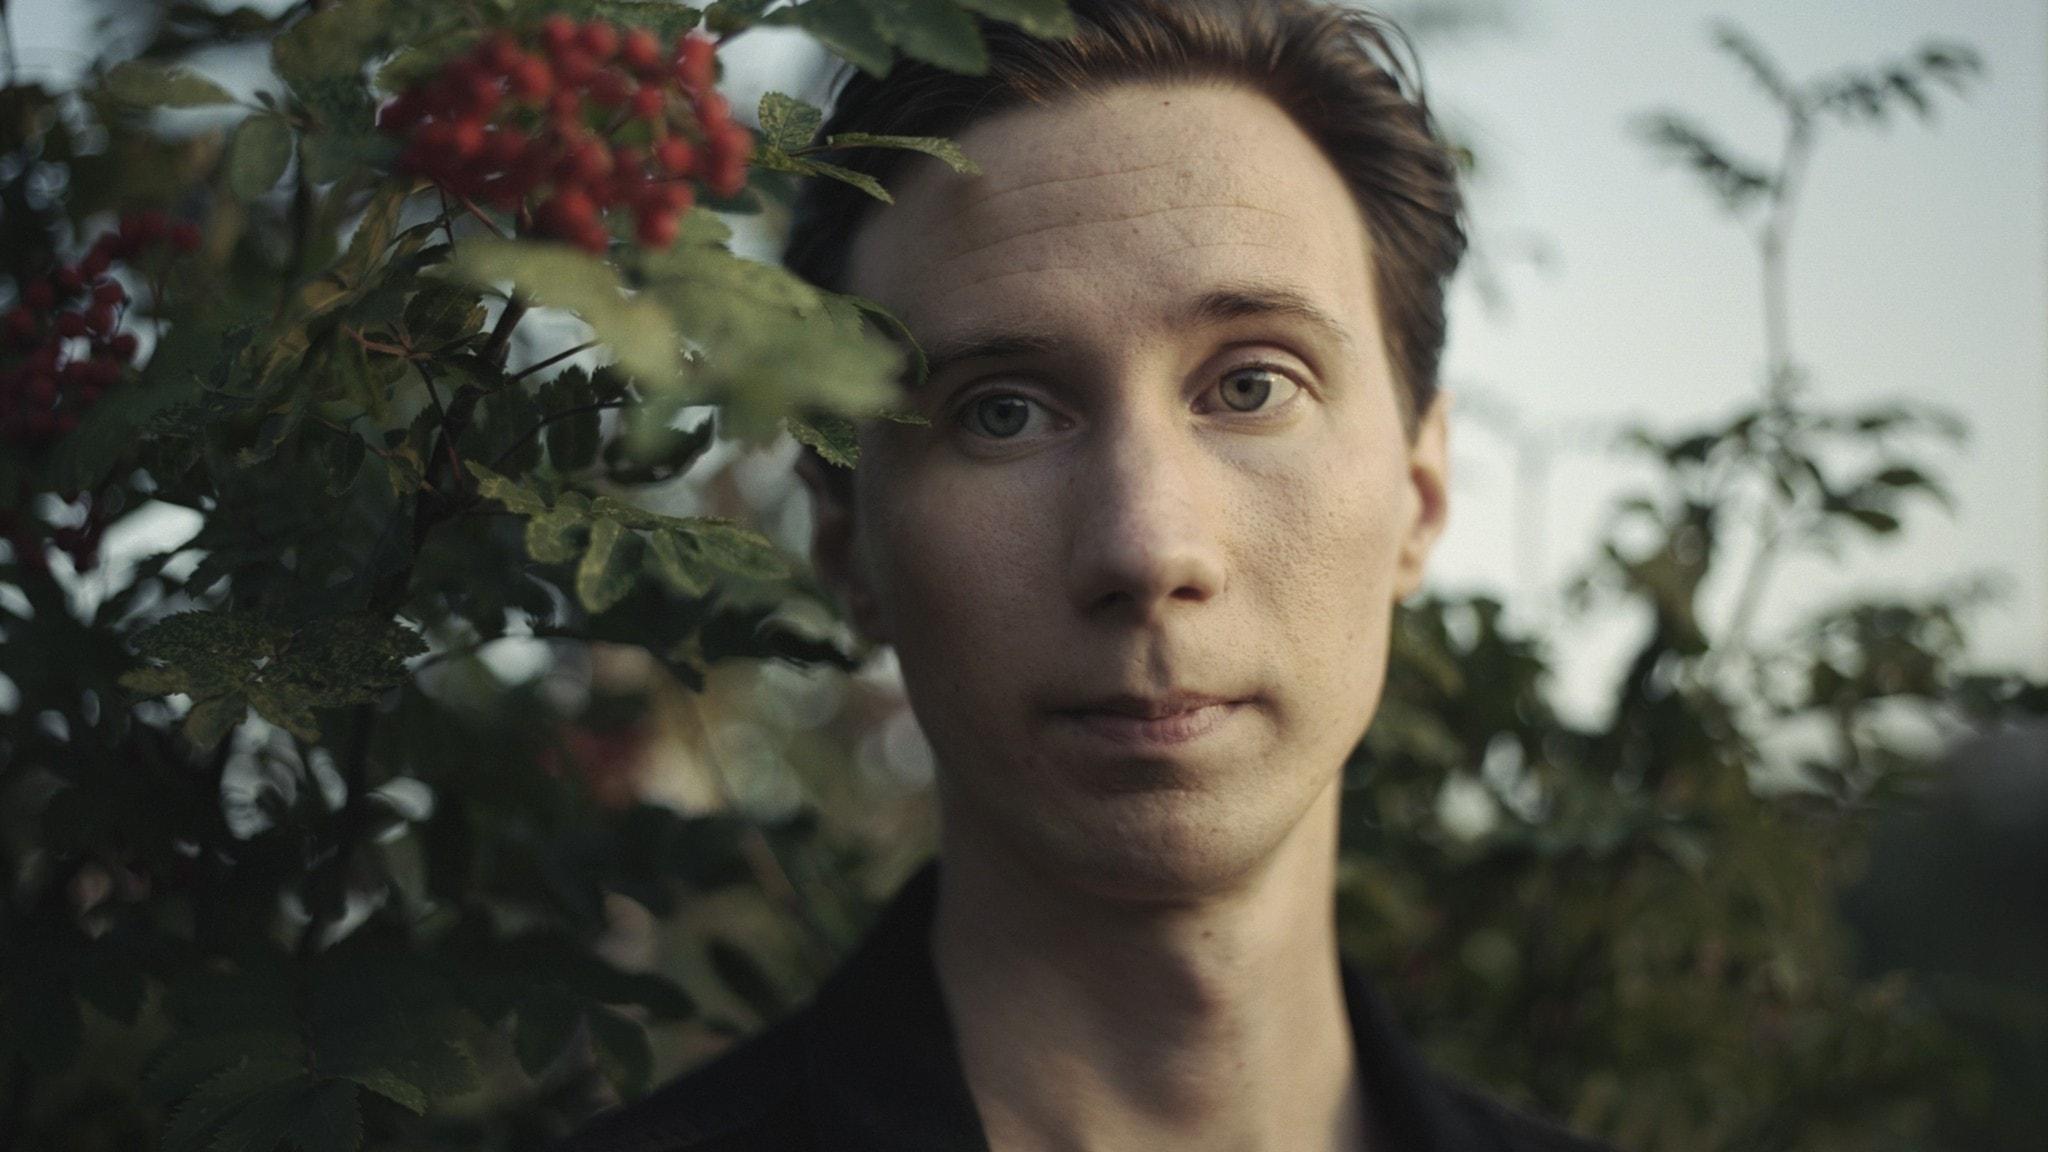 David Granström